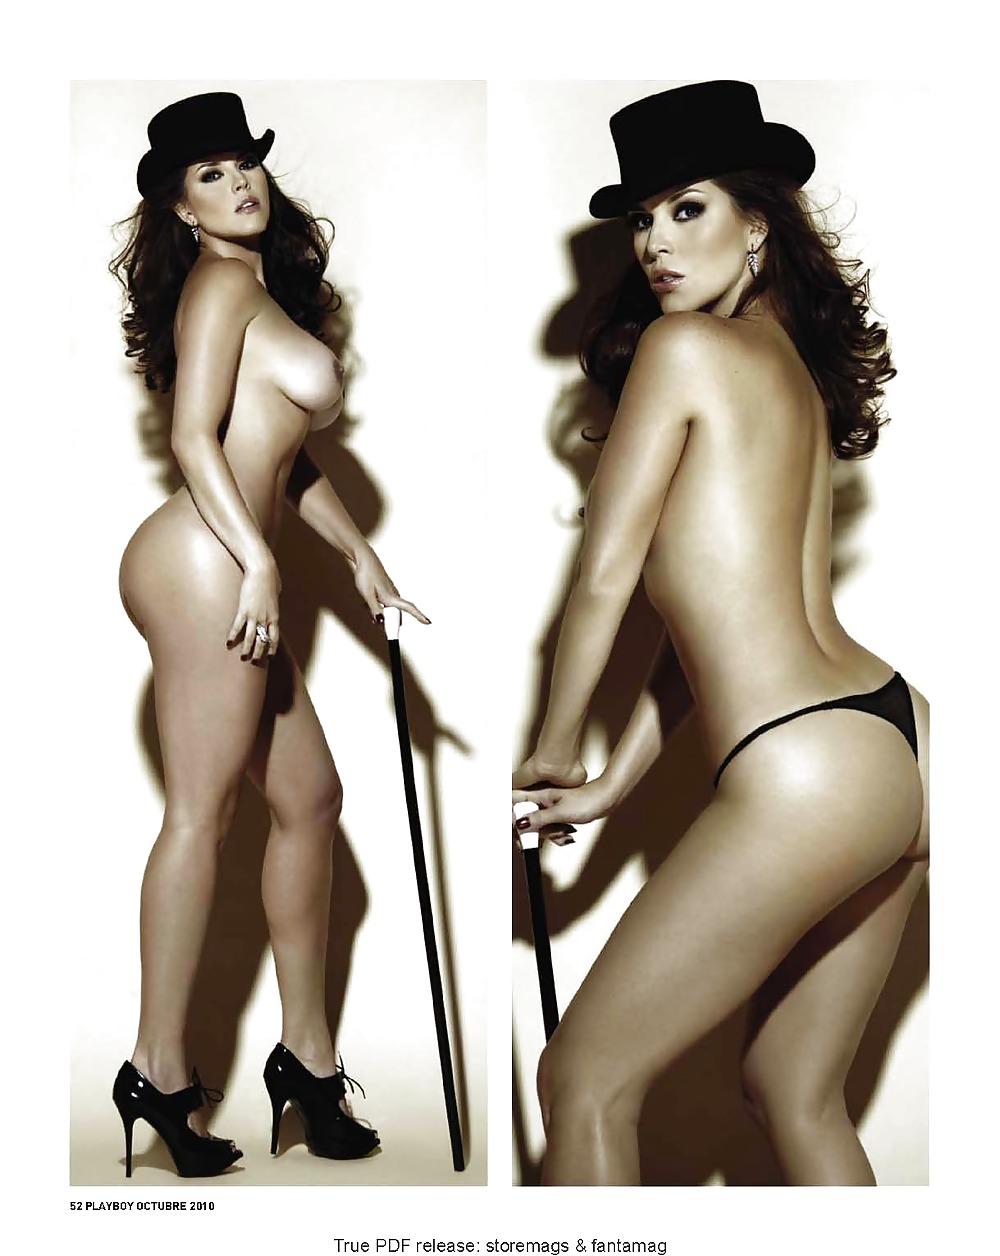 Miss universe alicia machado sex tape and nude photos